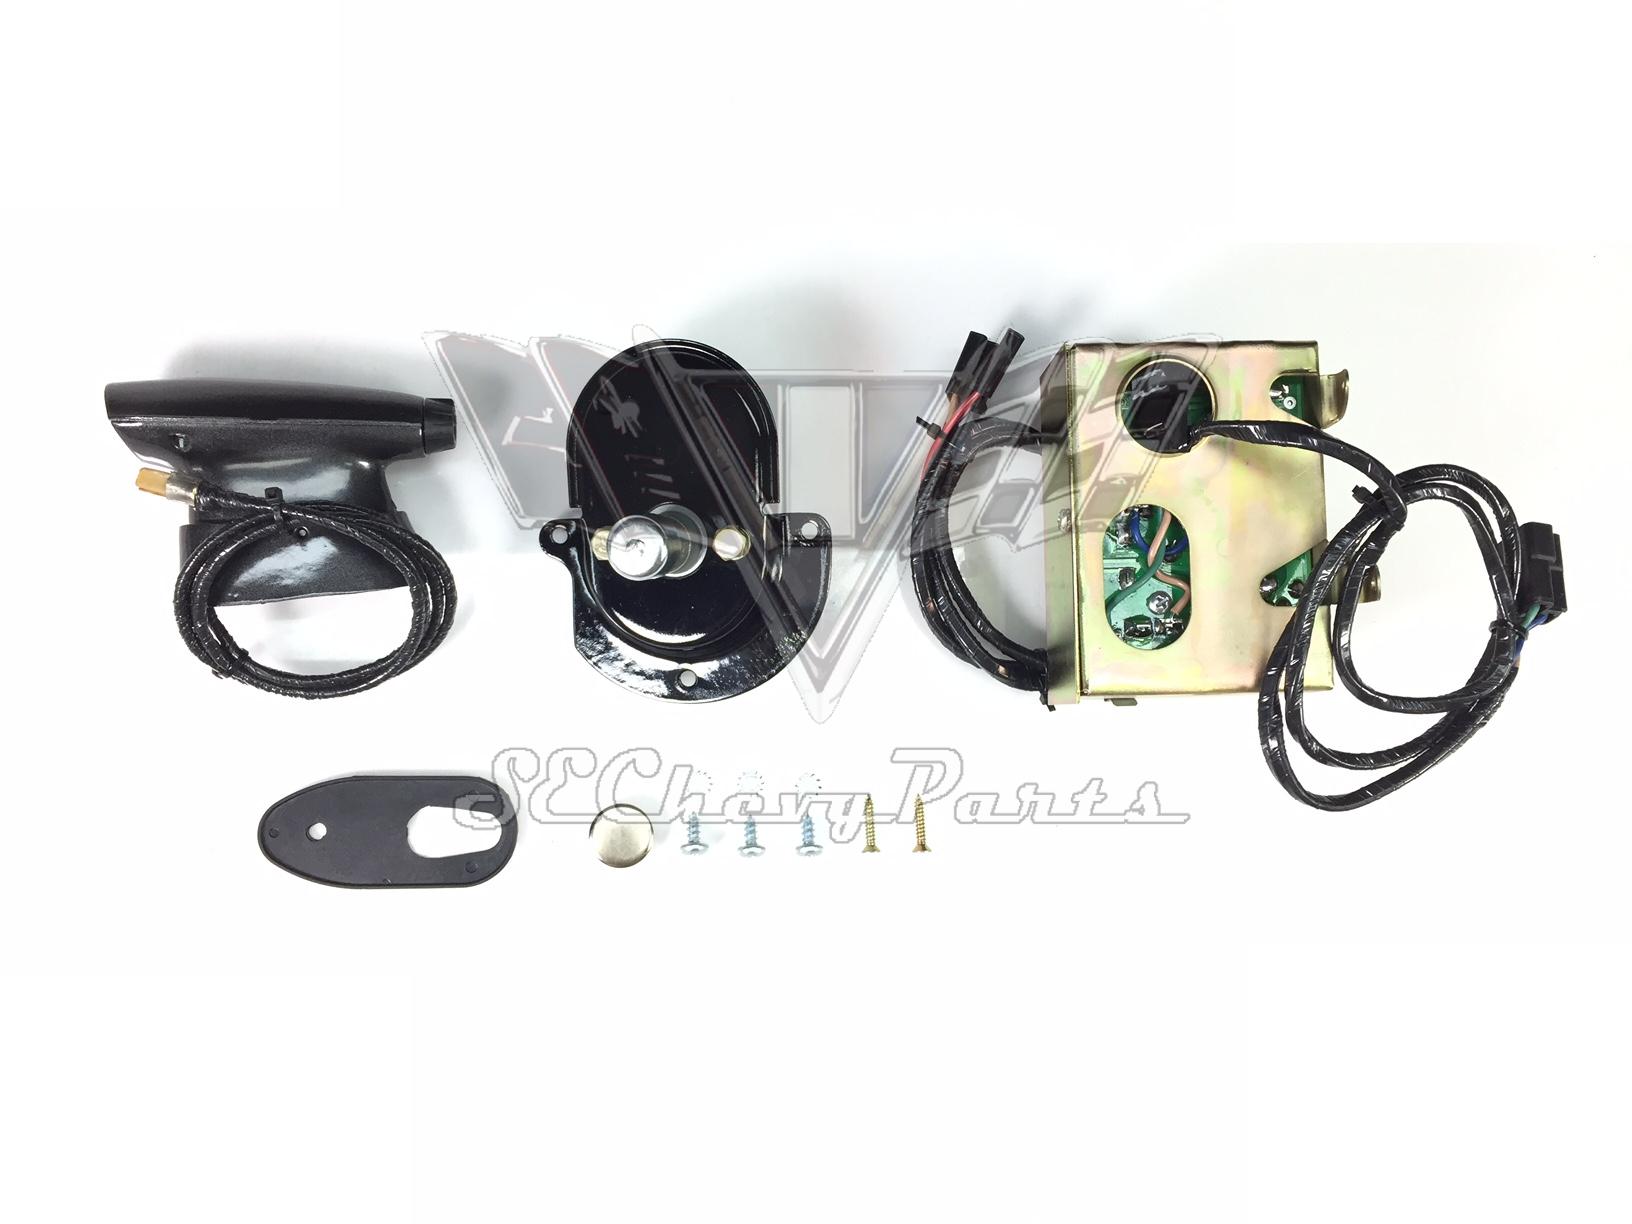 1960 chevy guide autronic eye headlight dimmer system restored